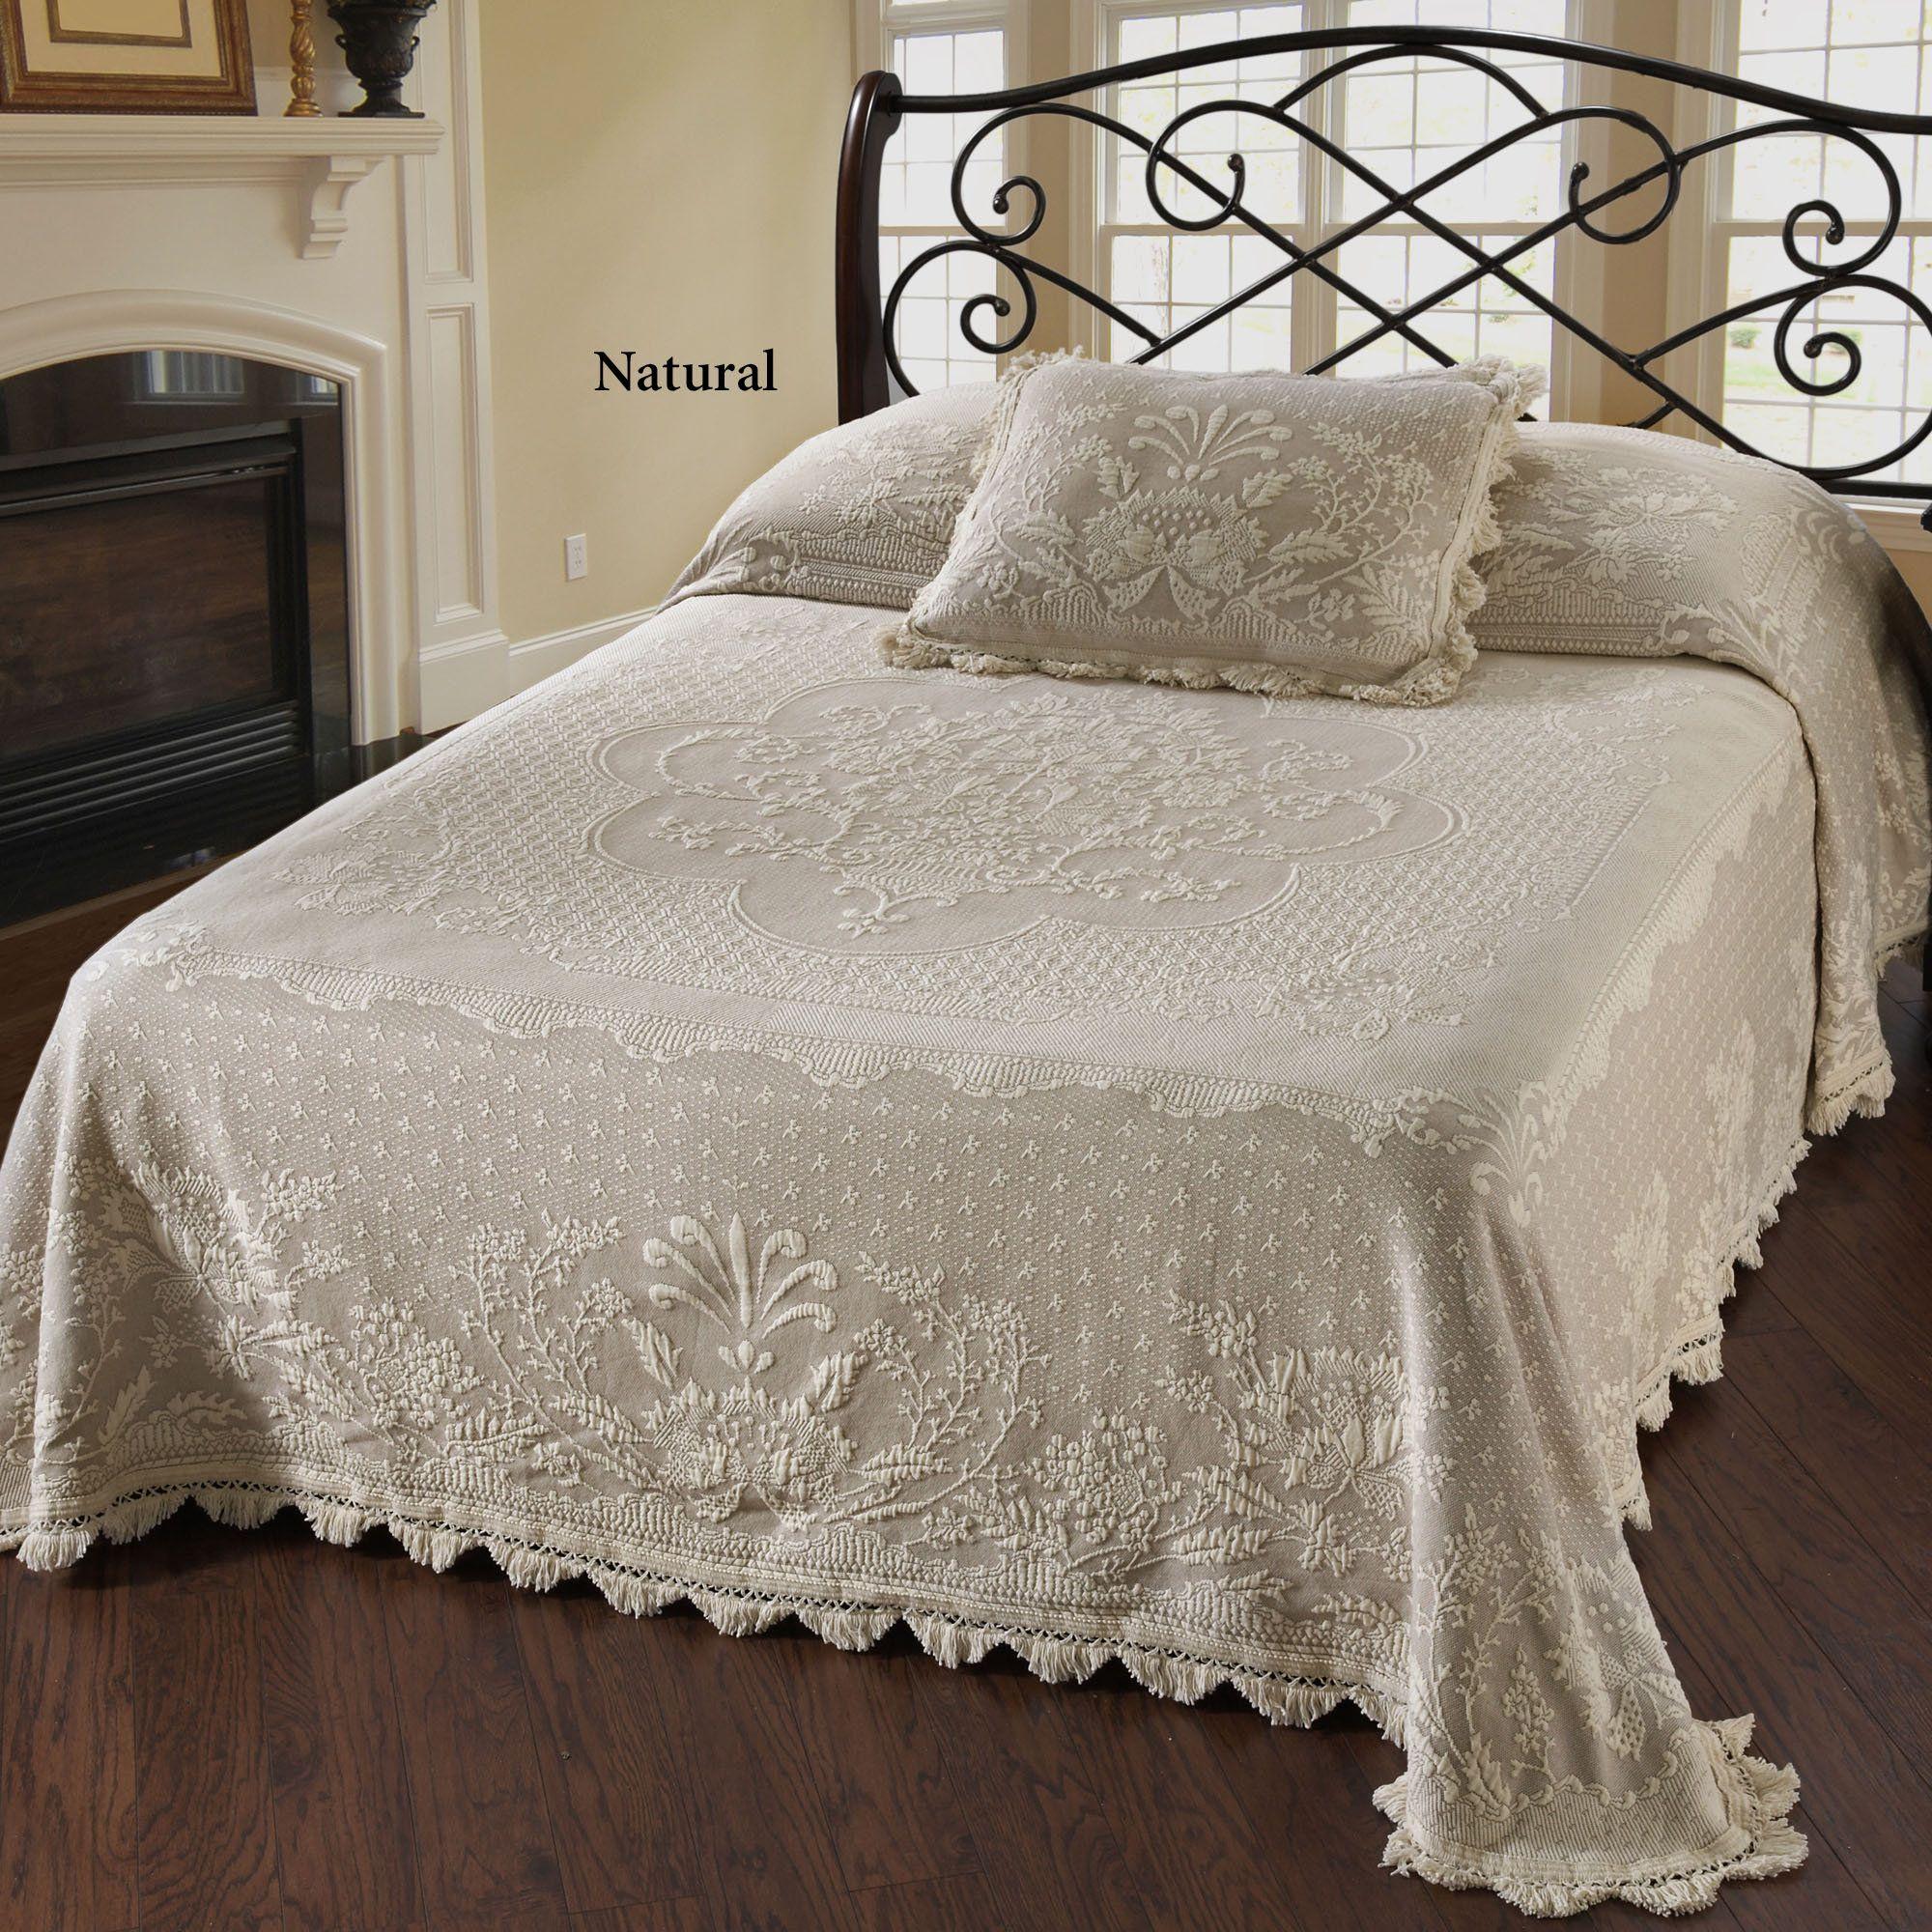 Bedspread design ideas - Abigail Adams Woven Matelasse Bedspread Bedding